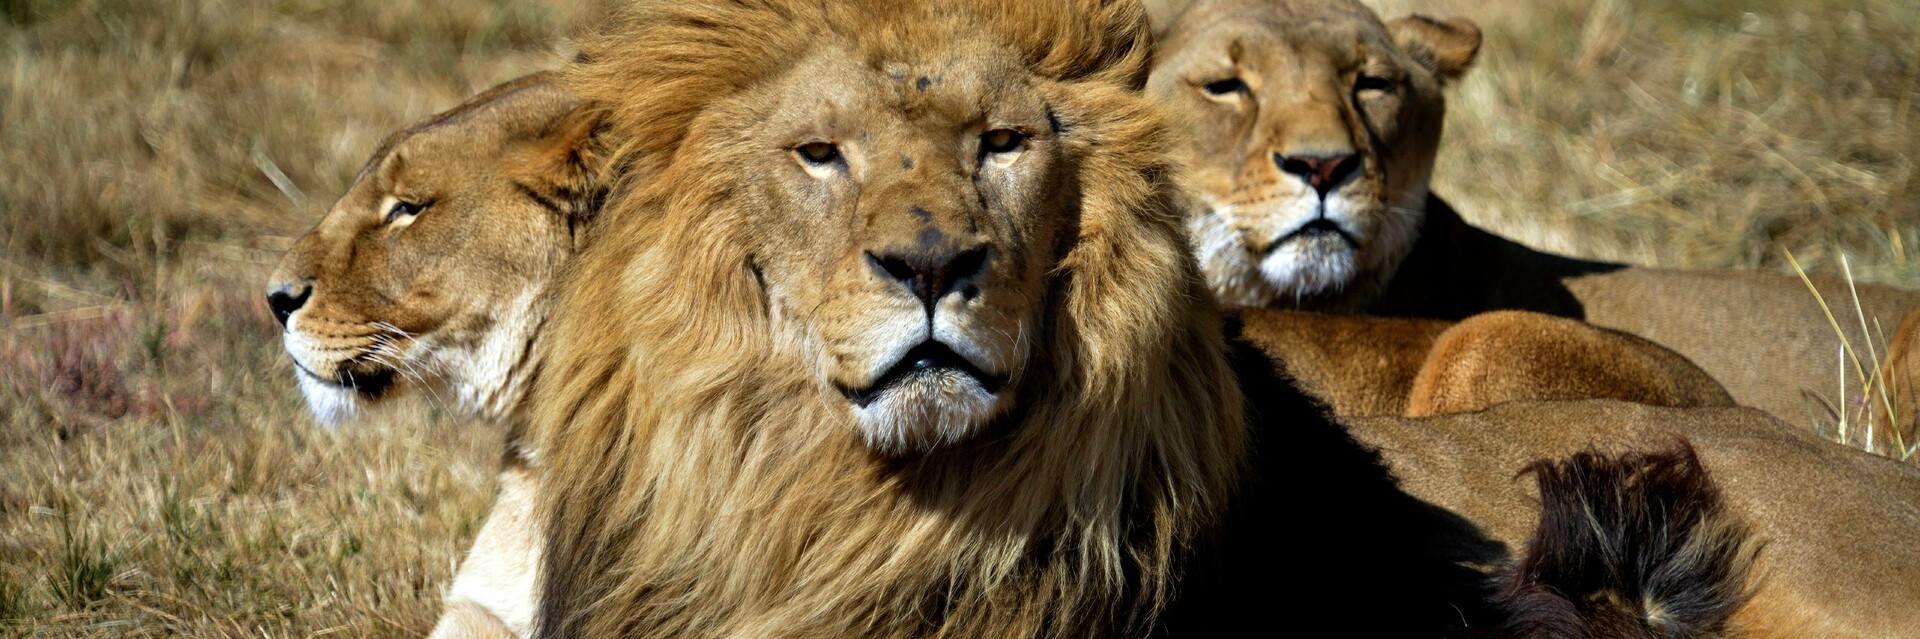 Lions at LIONSROCK